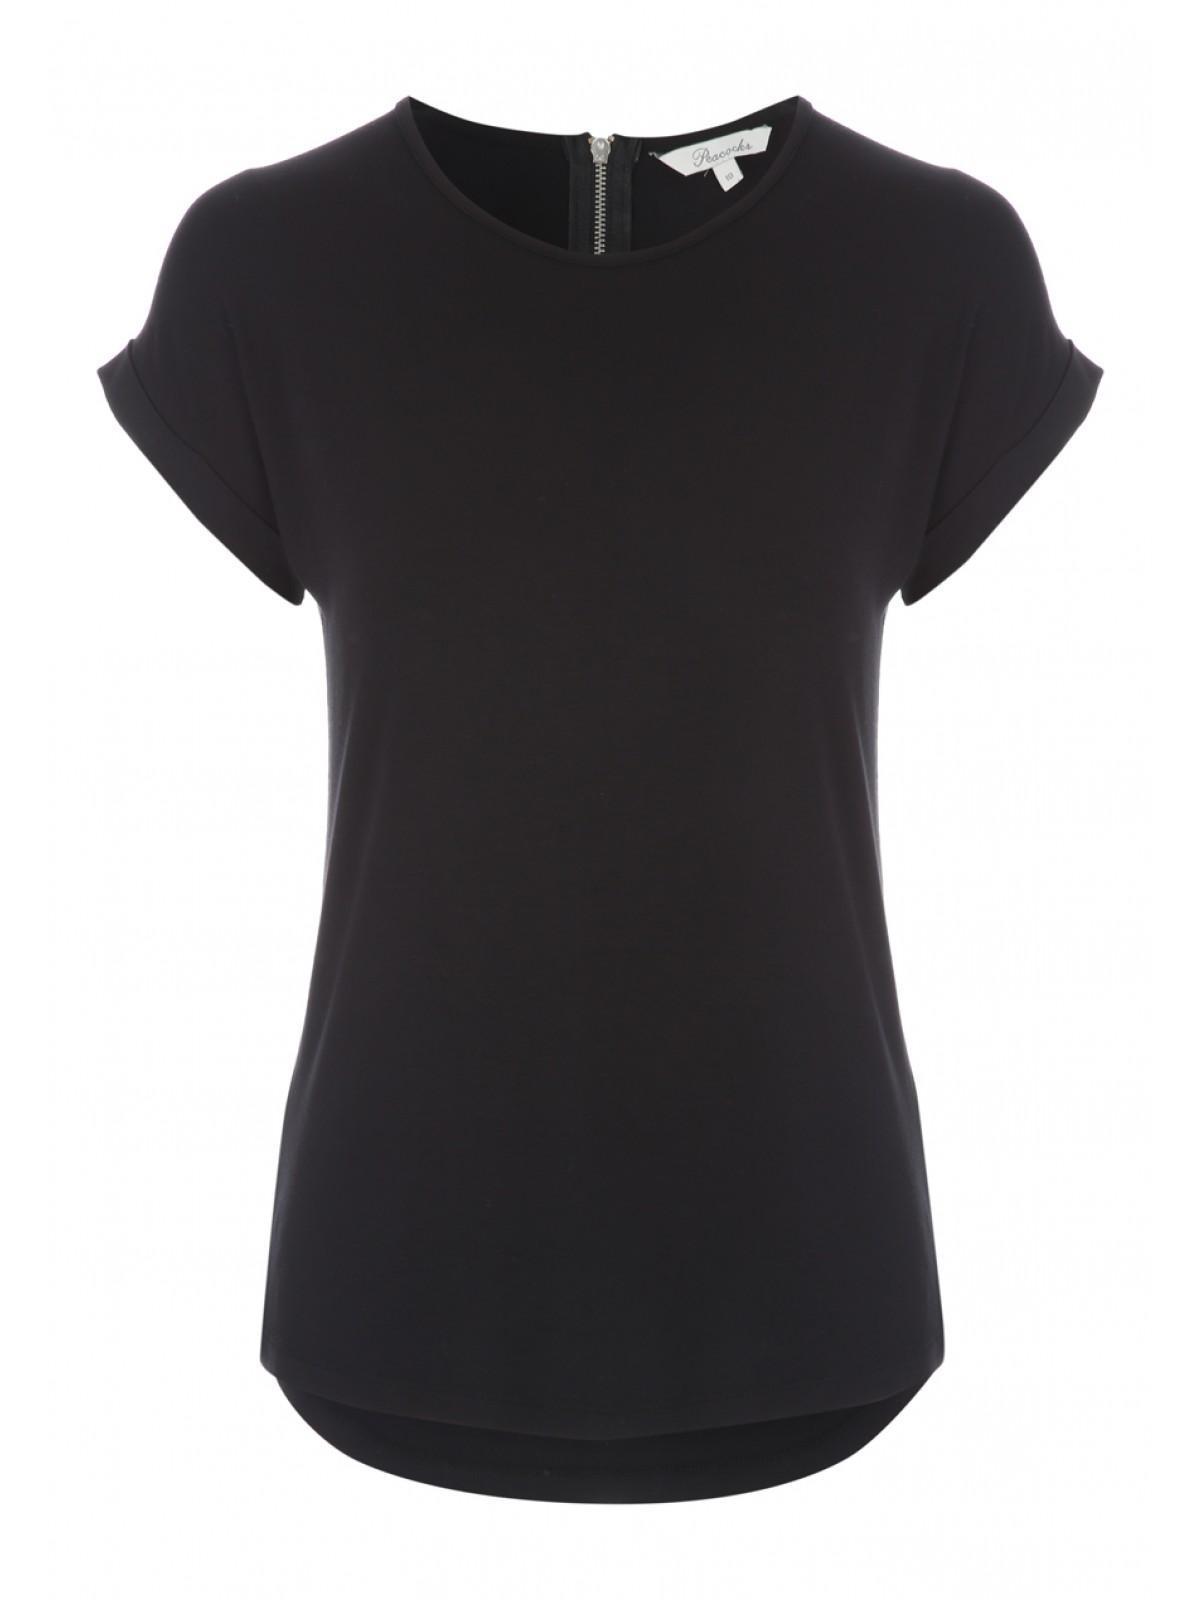 Black t shirt zips - Black T Shirt Zips 48